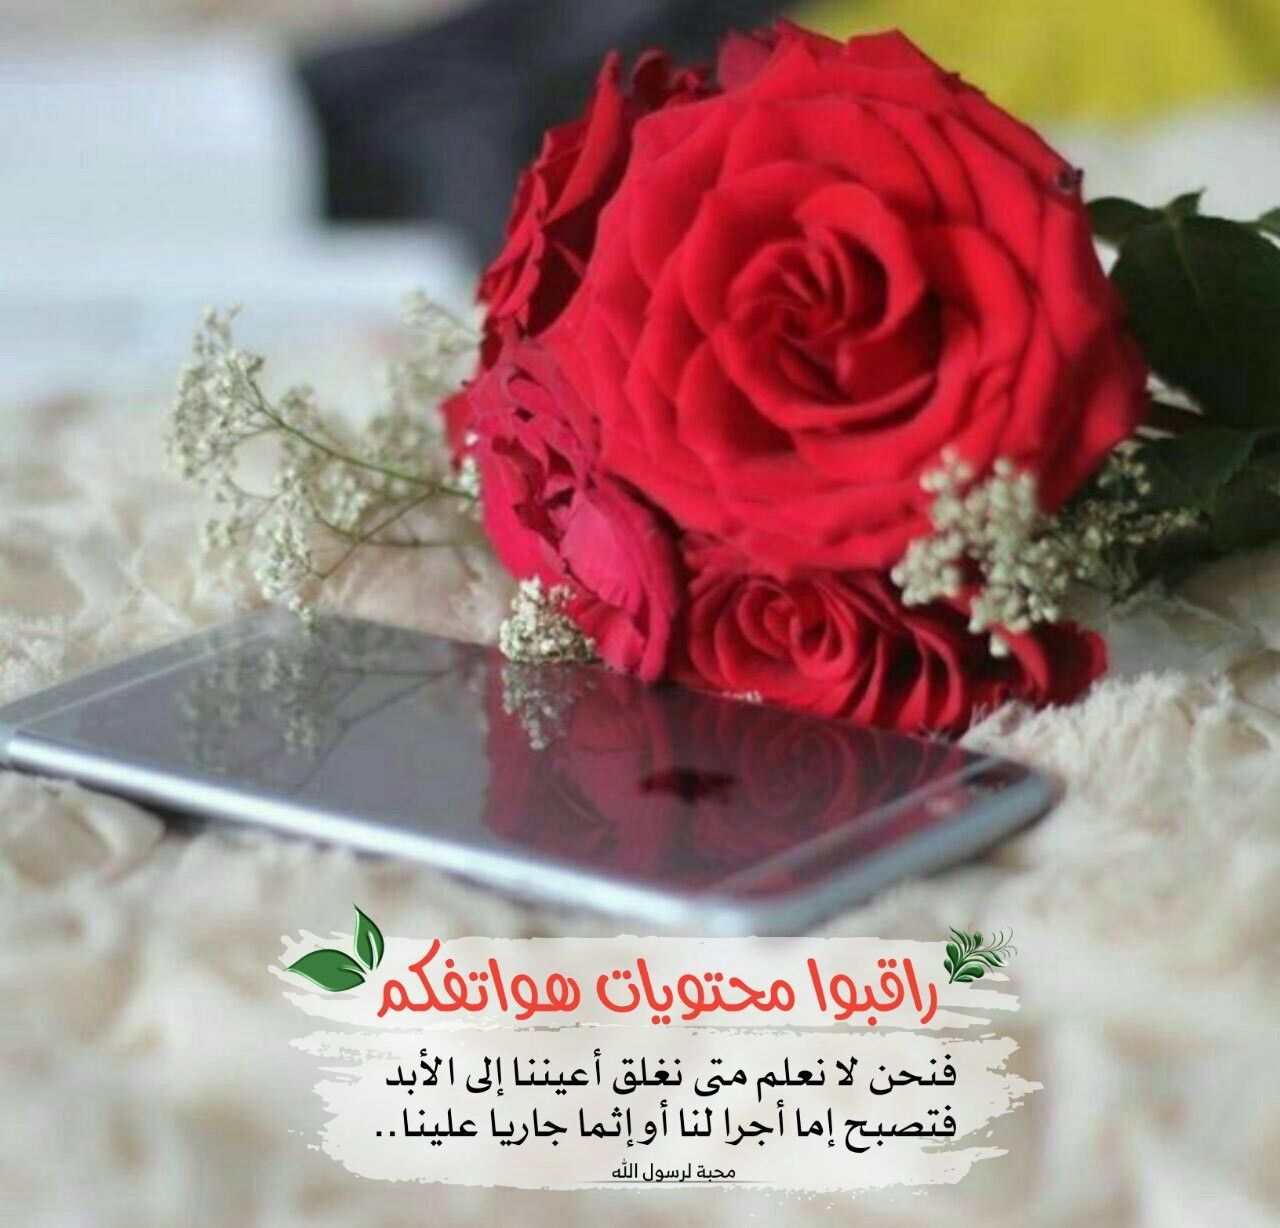 Pin By رحمة عبد الهادي On أجيب دعوة الداعي Profile Picture For Girls Rose Flowers Dp